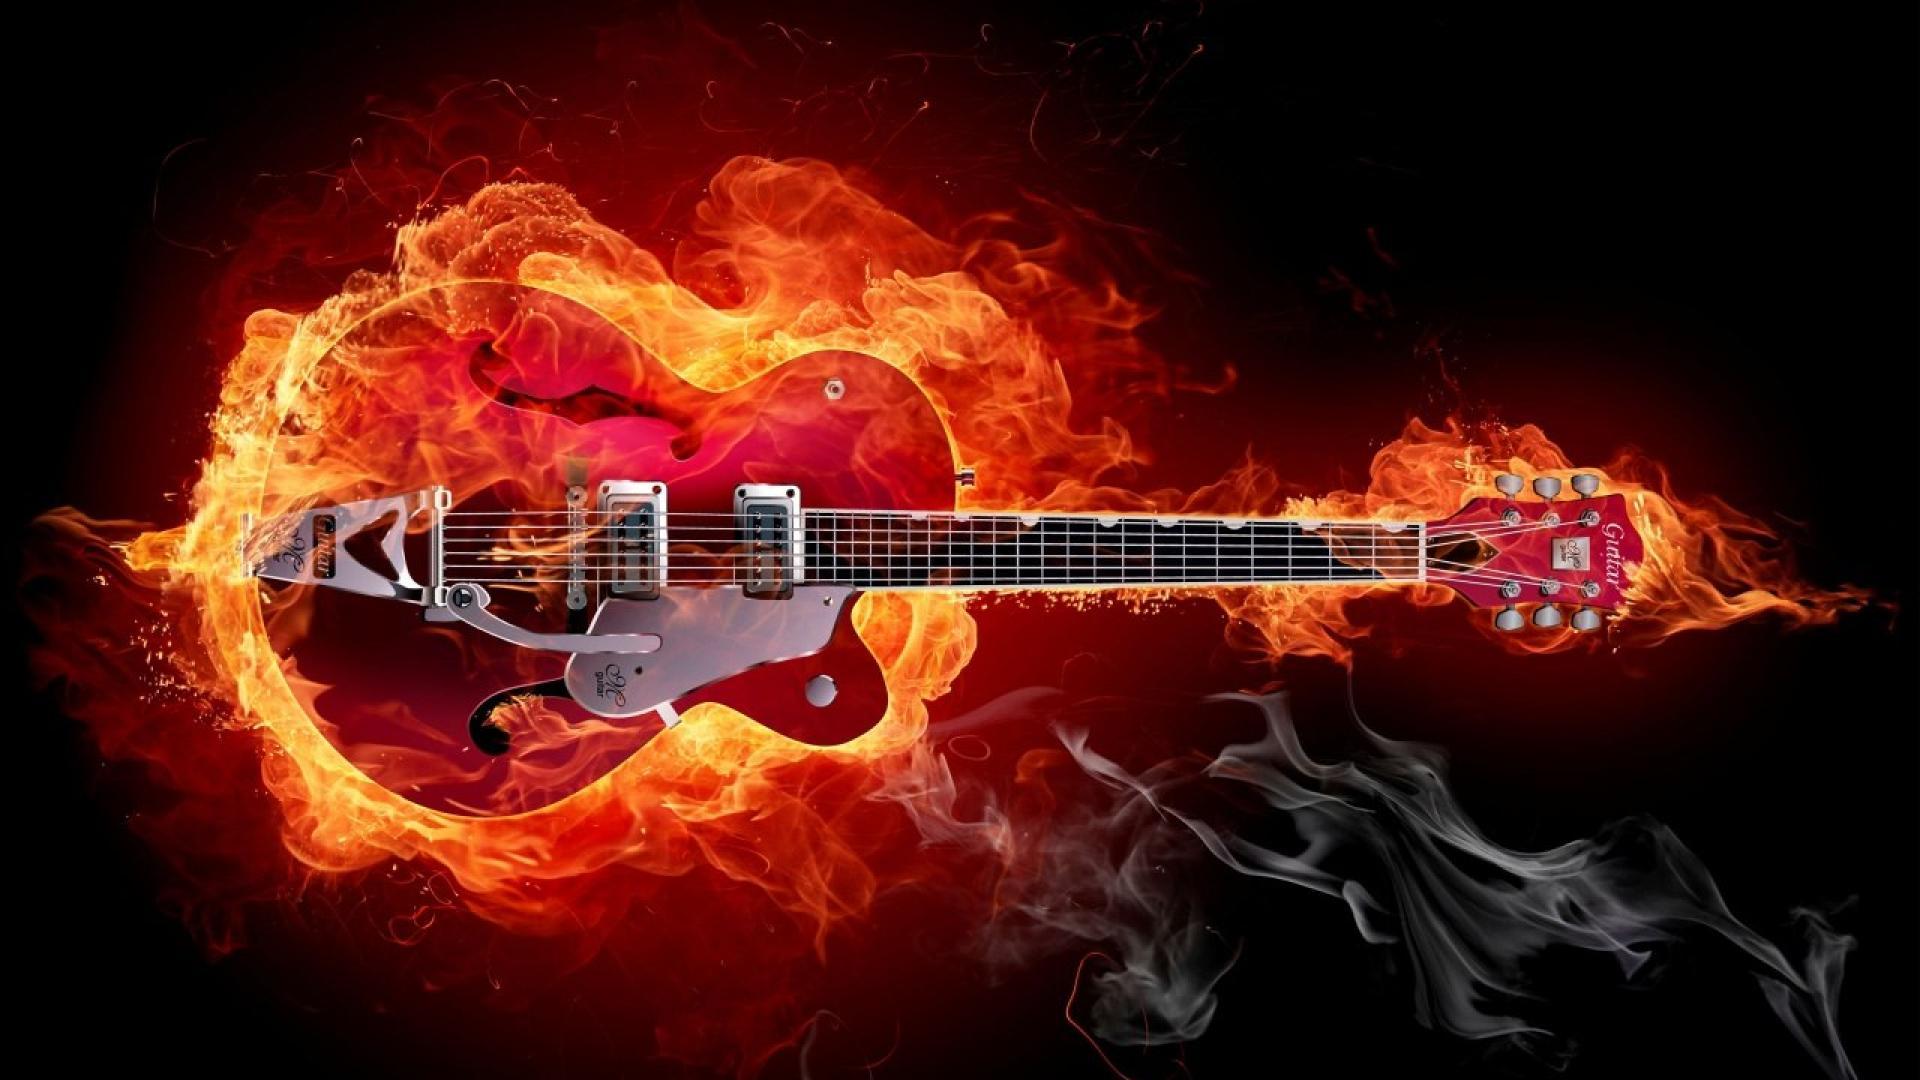 guitar wallpaper widescreen - photo #6